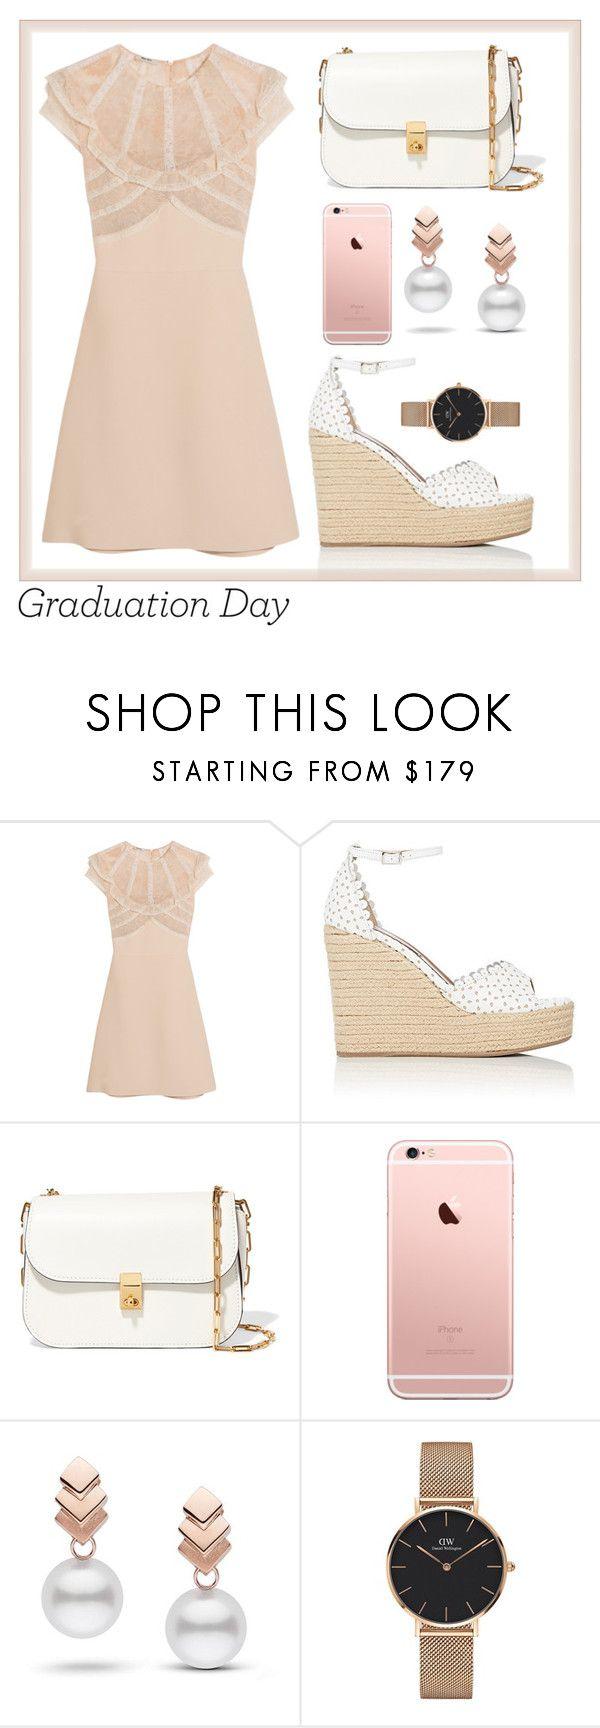 """Graduation day"" by aashna-makkar ❤ liked on Polyvore featuring Miu Miu, Tabitha Simmons, Valentino, Escalier, Daniel Wellington, dress, college, pastel and contestentry"